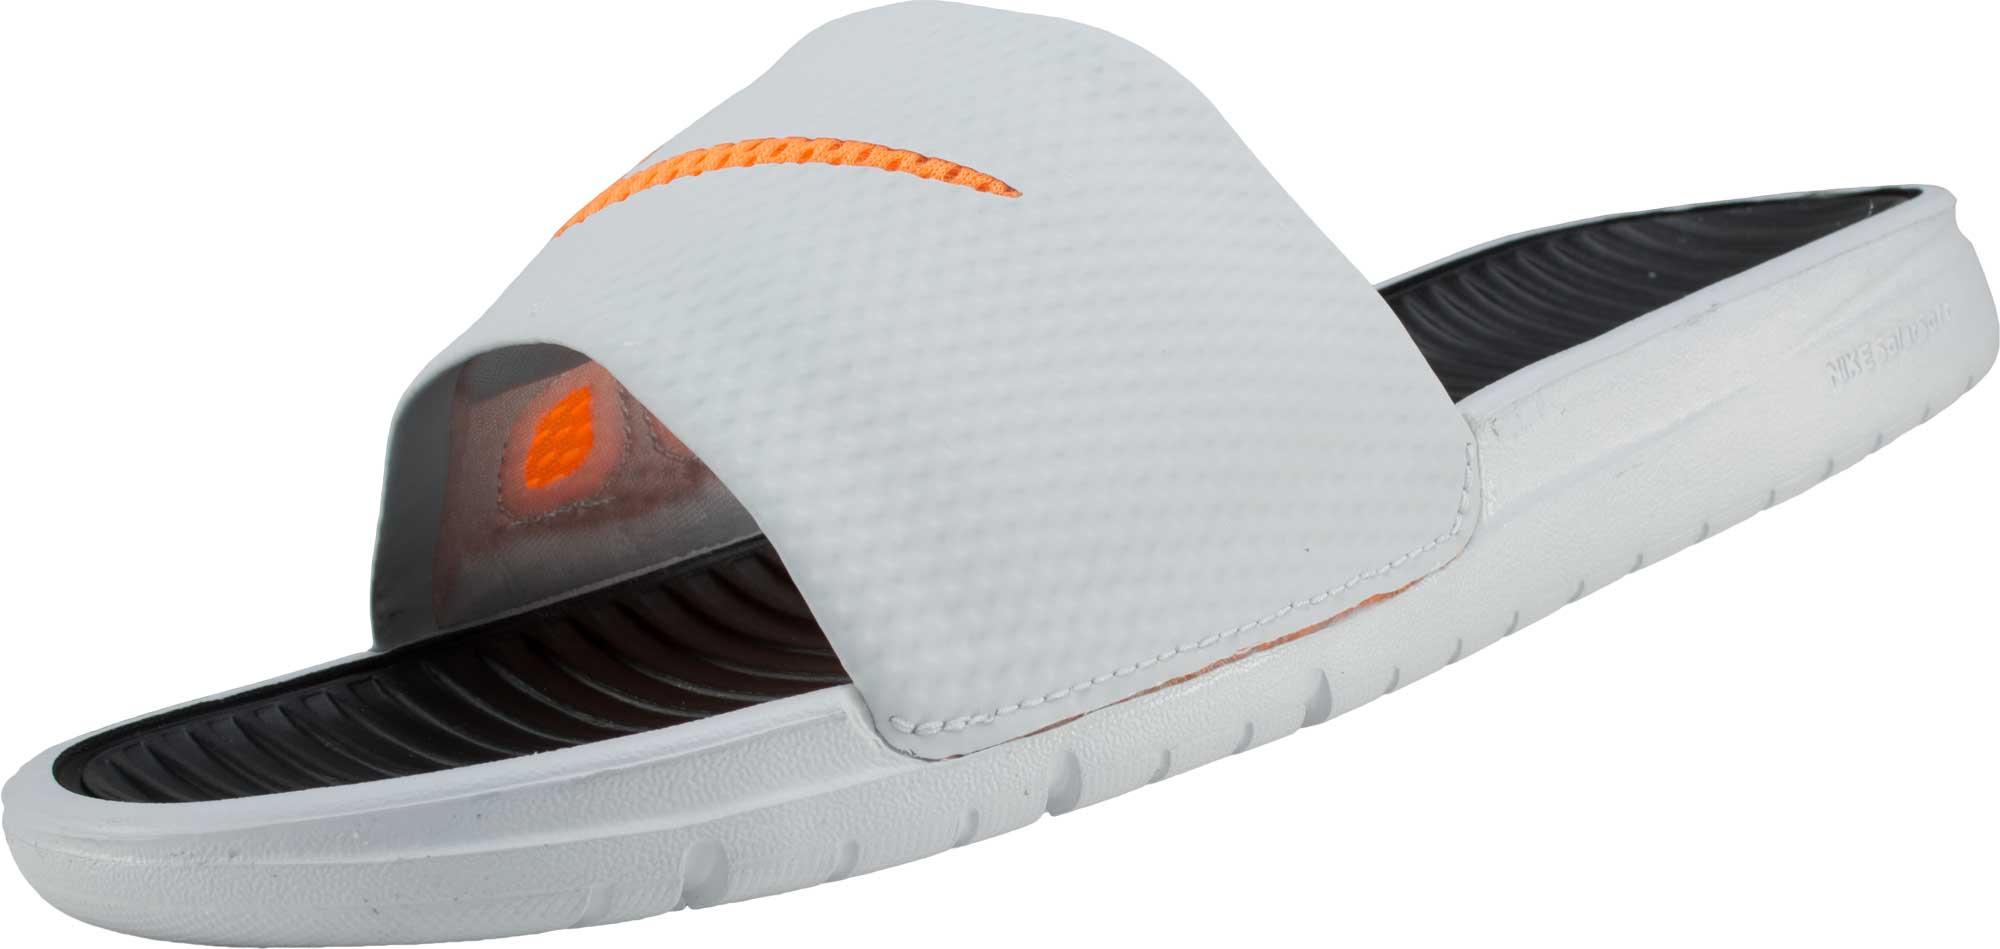 fd9ffed69a74 Nike Soccer Sandals - Nike Benassi Solarsoft Slides